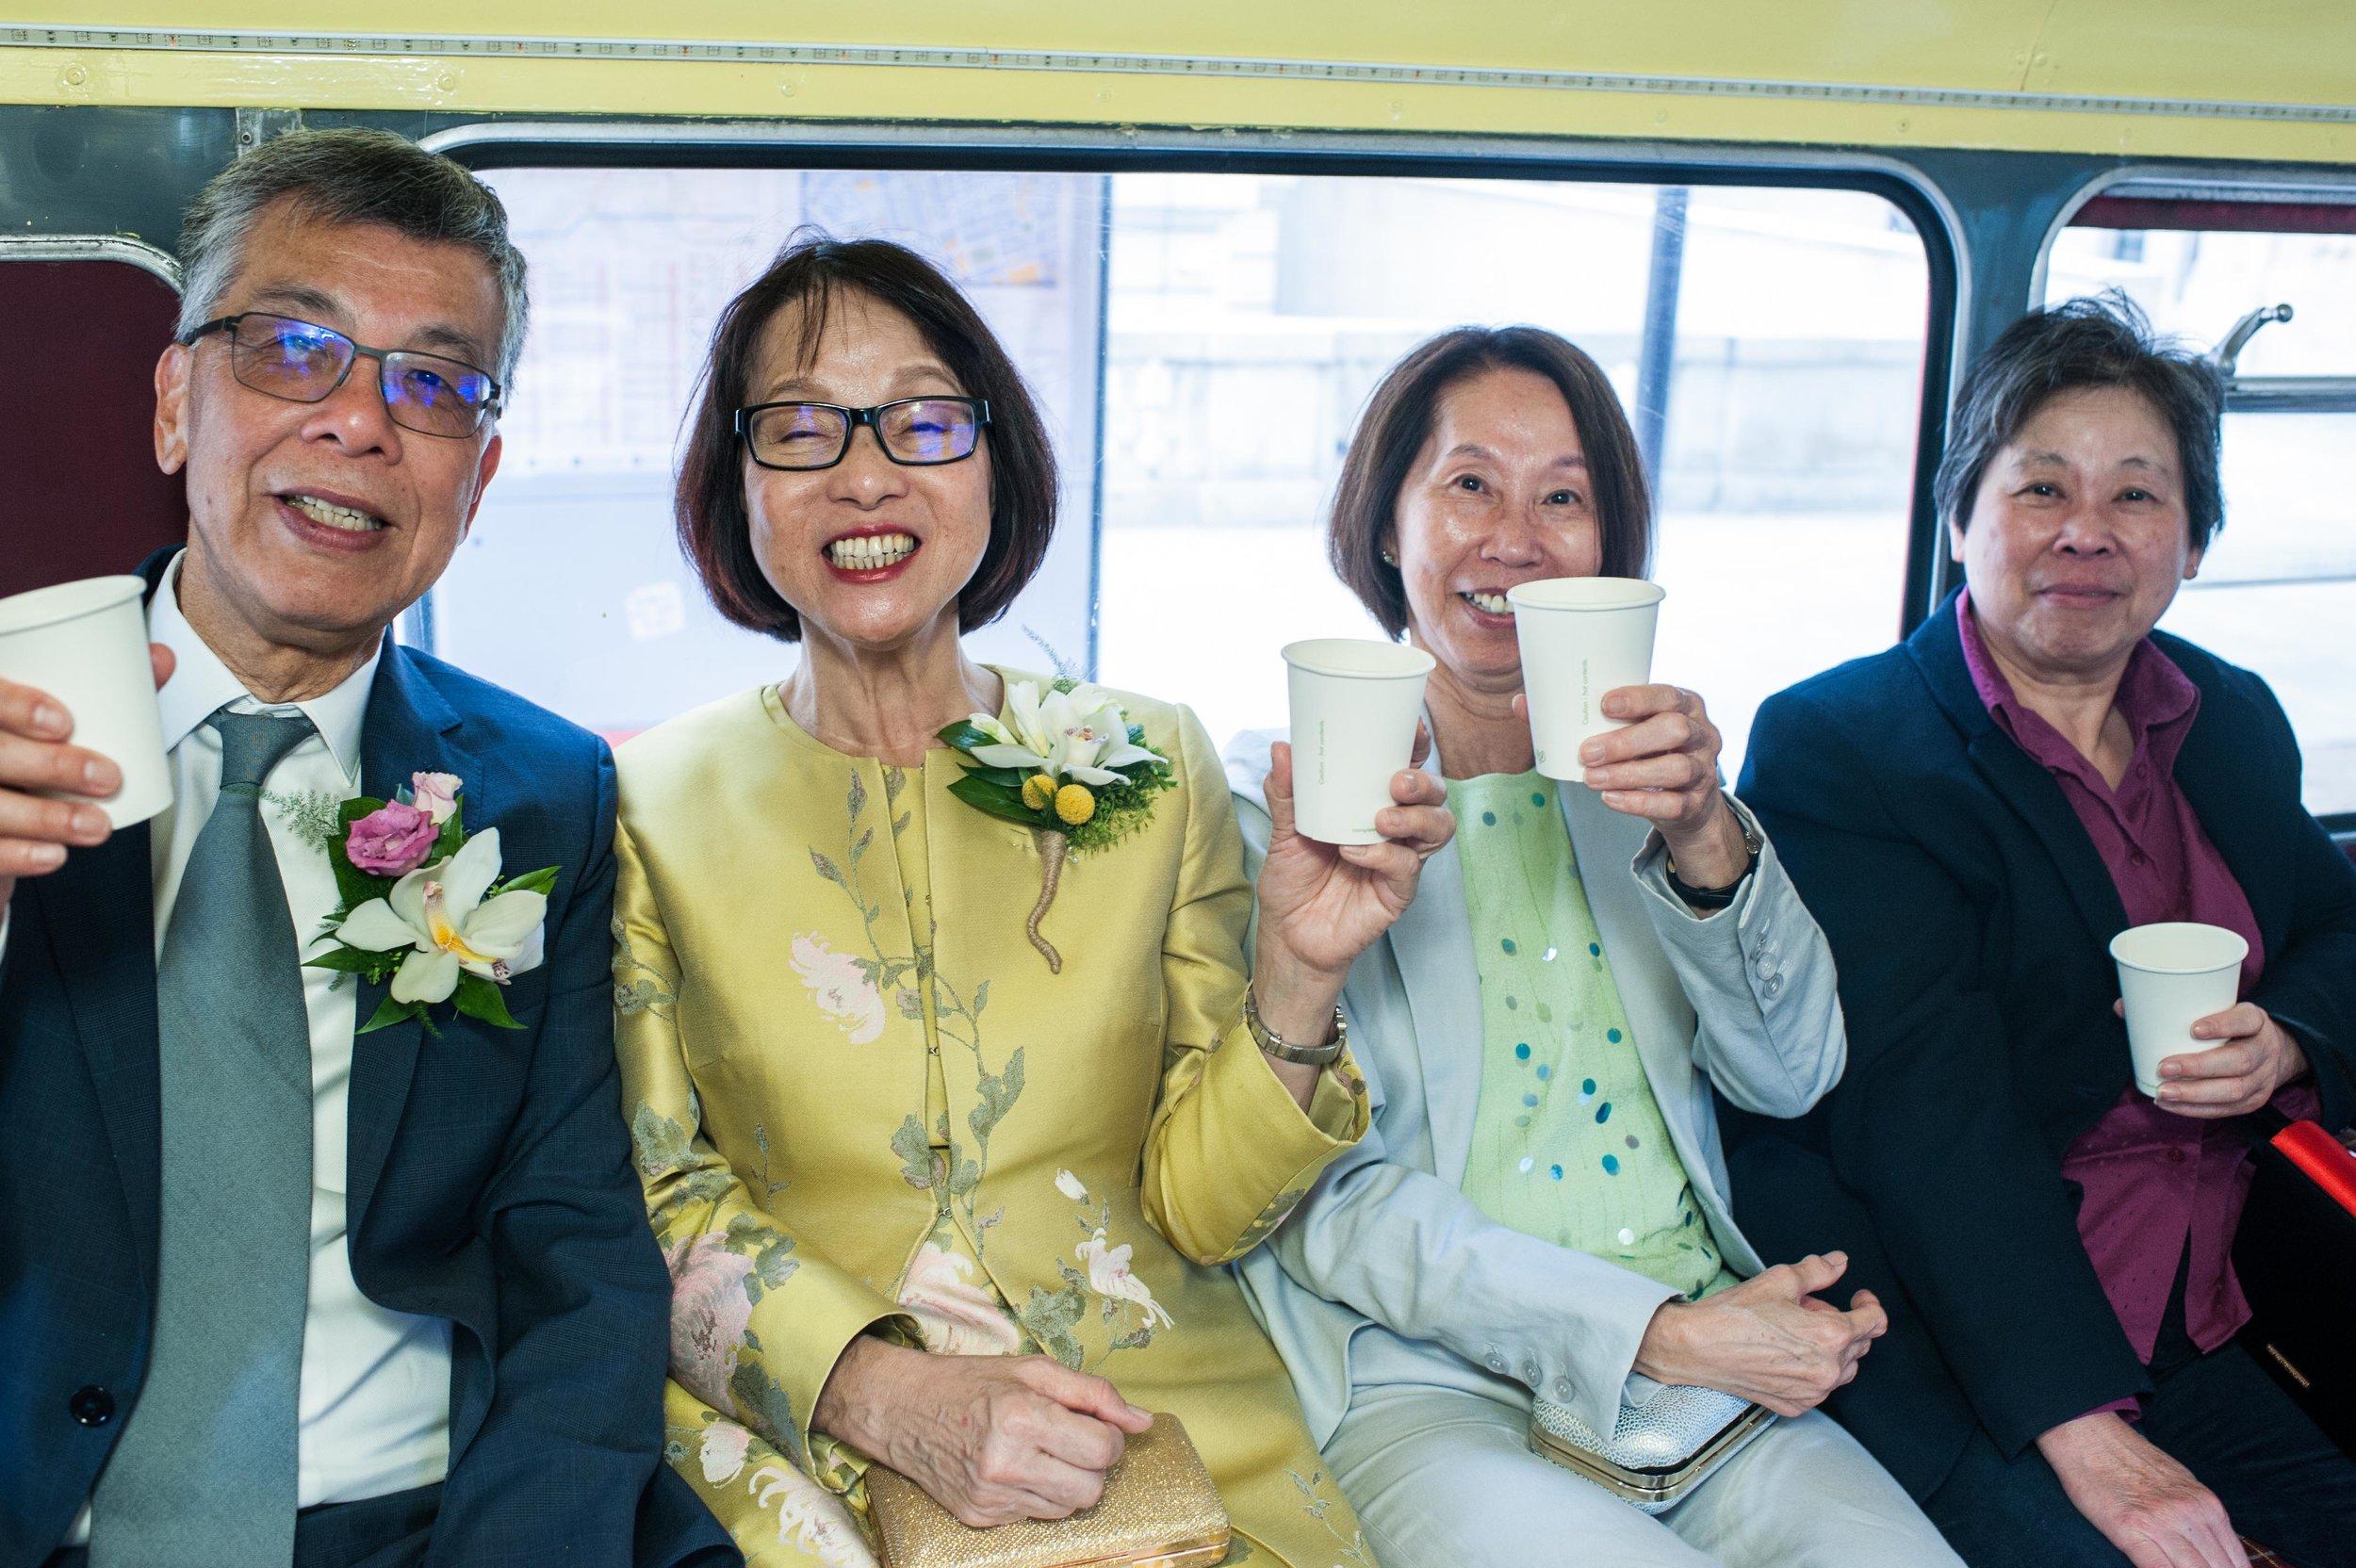 D&M_Marylebone Town Hall Wedding (167 of 239).jpg